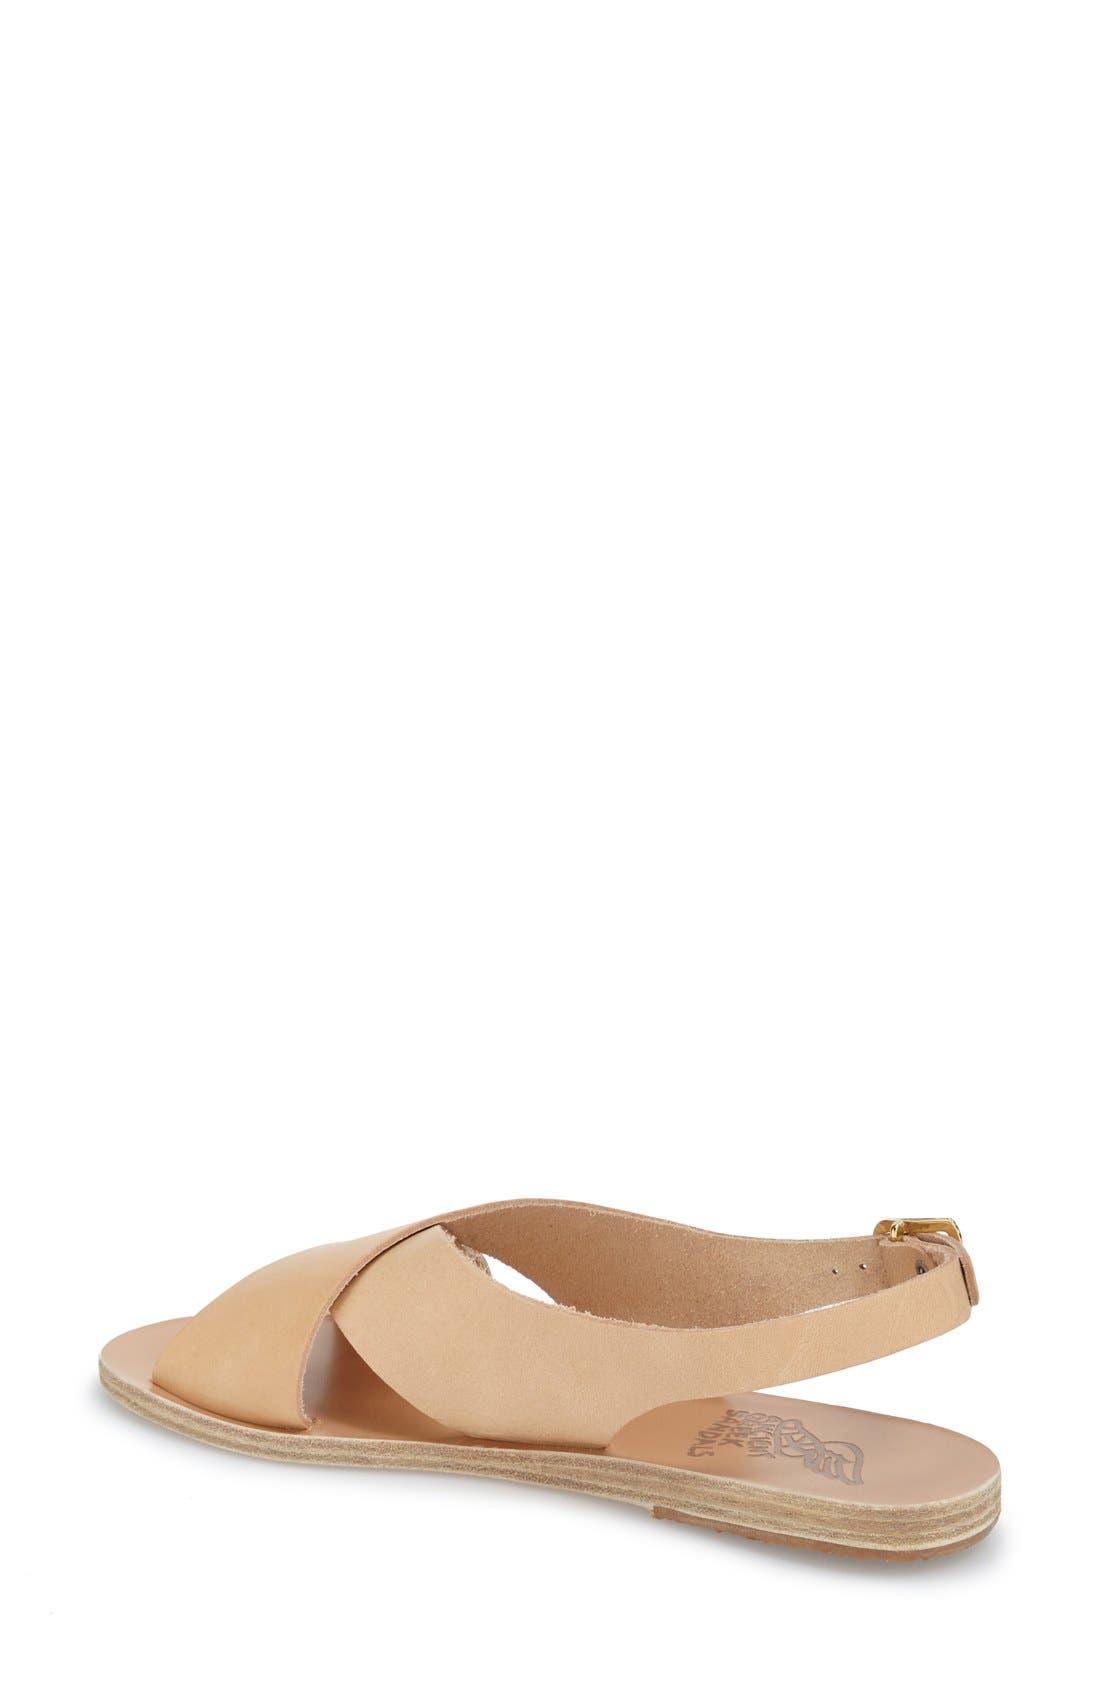 Alternate Image 2  - Ancient Greek Sandals 'Maria' Leather Slingback Sandal